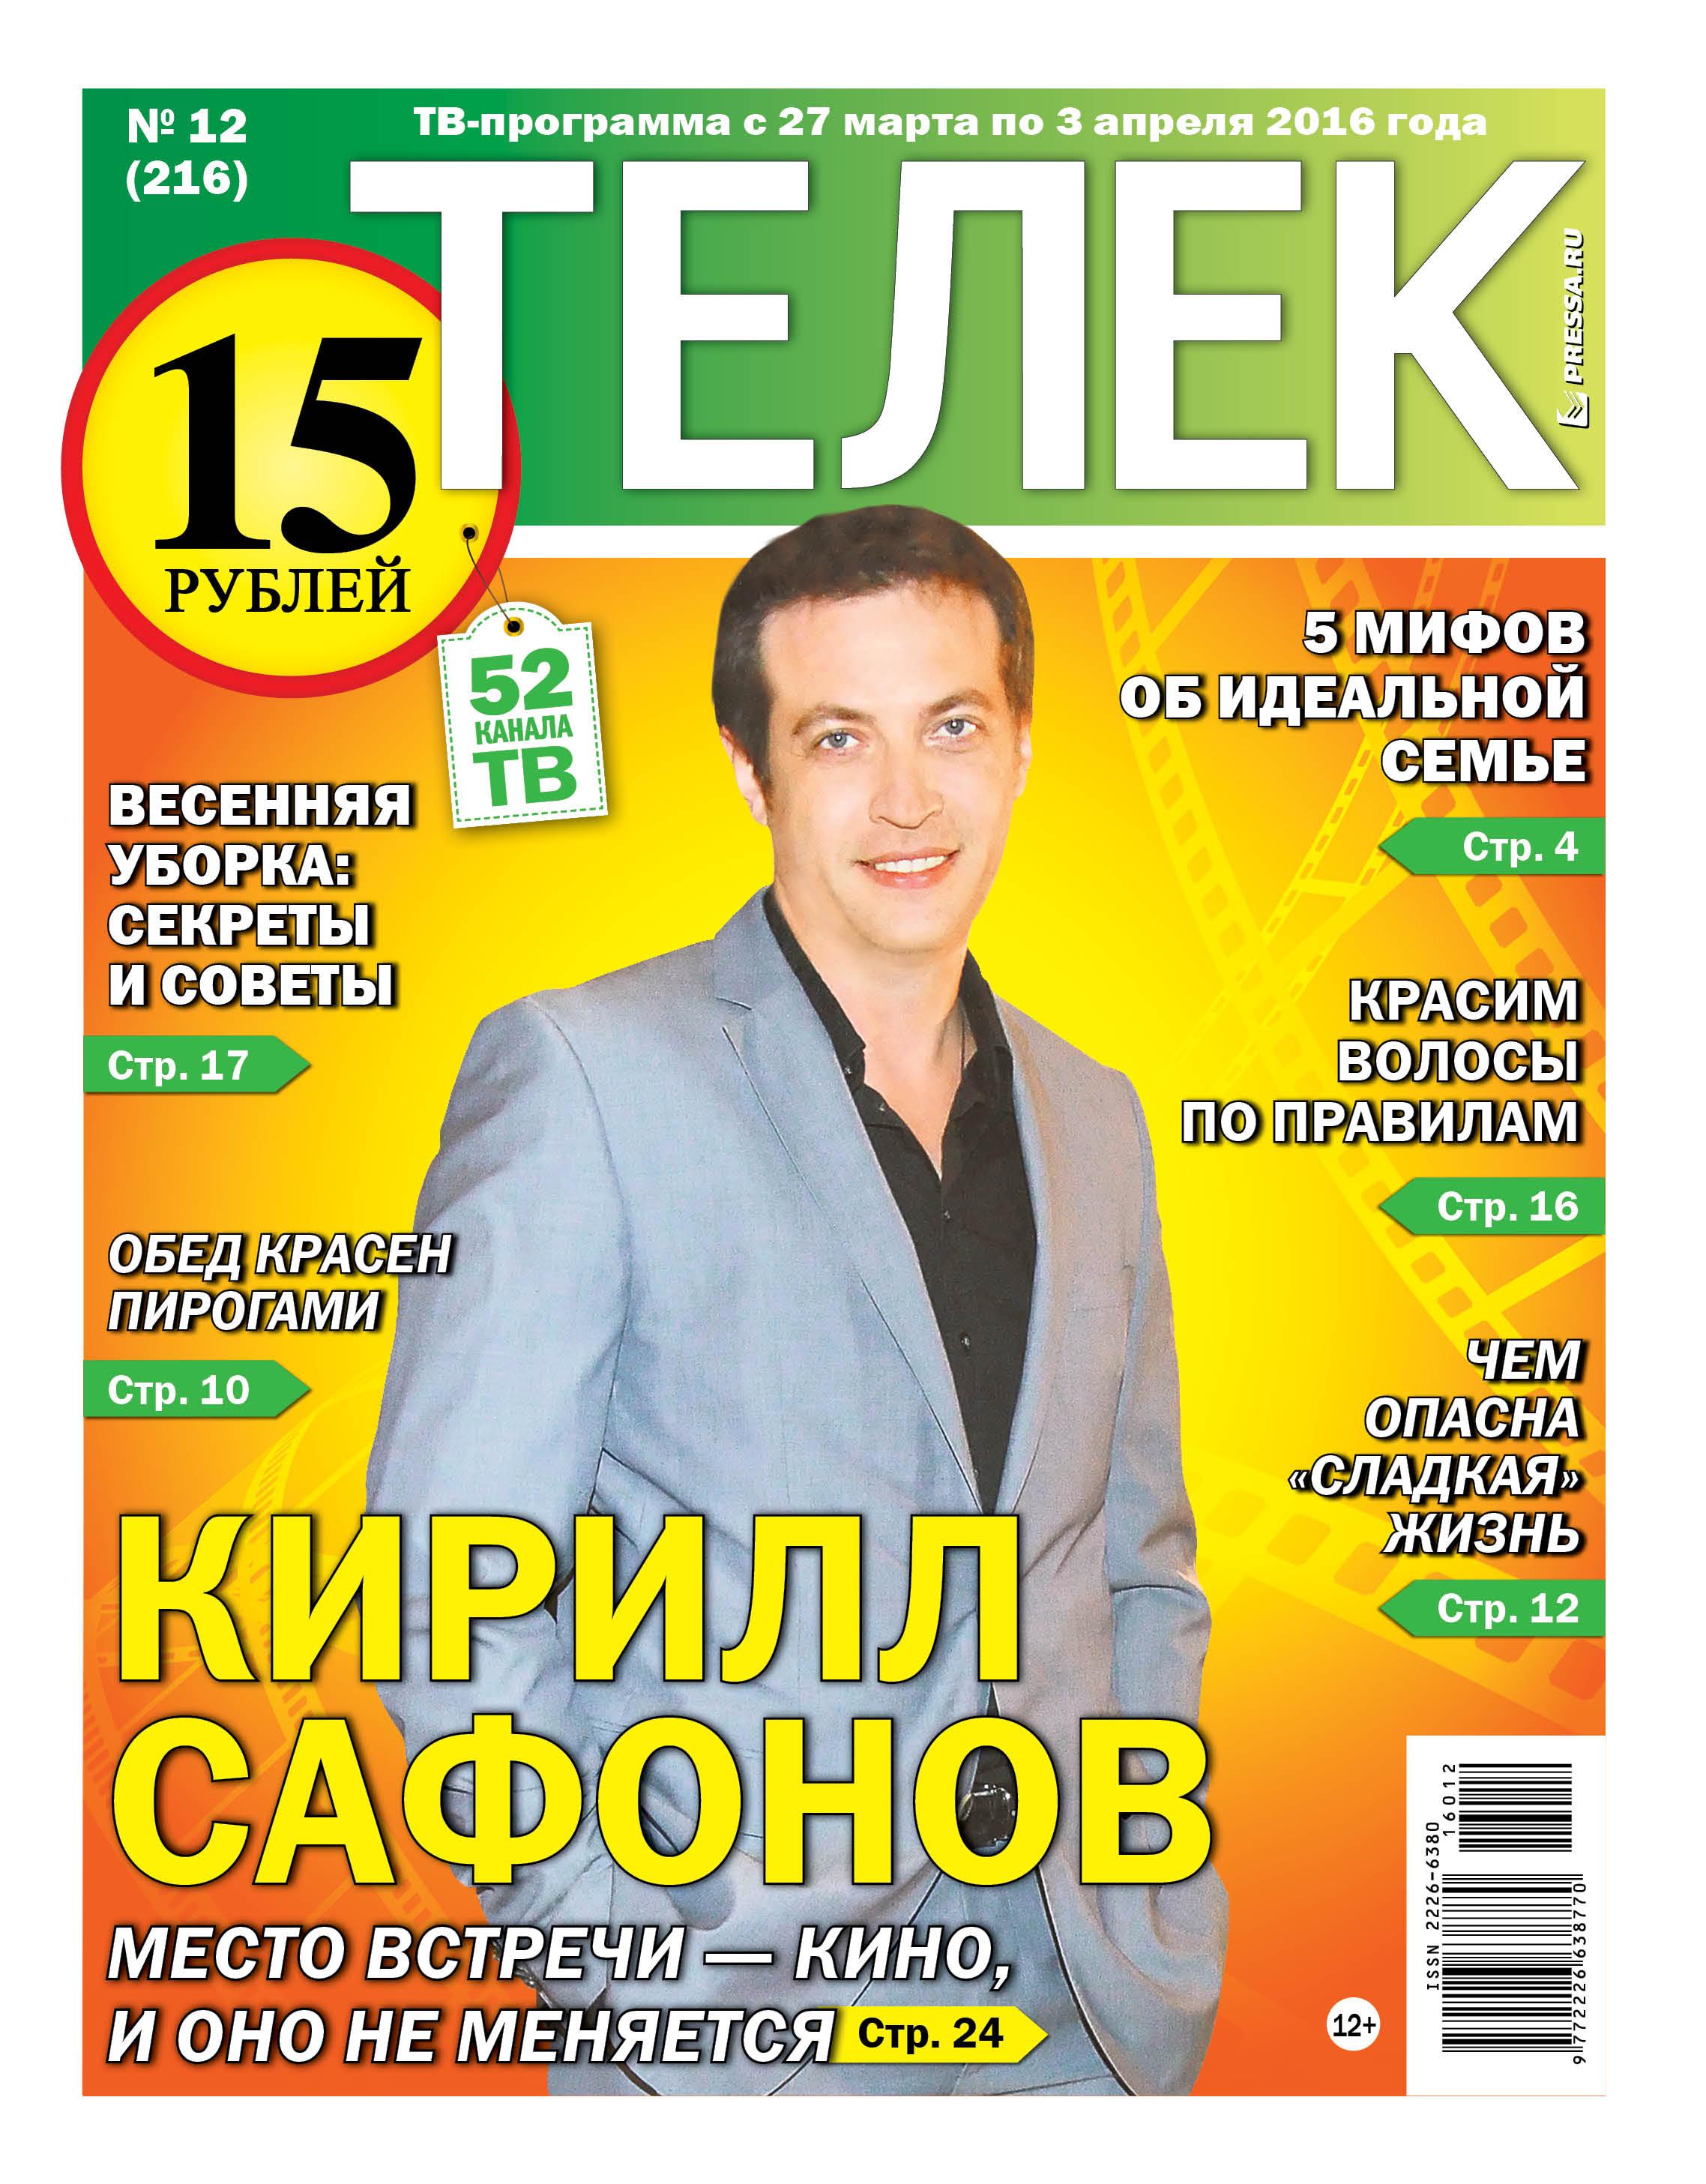 №12 (216) Кирилл Сафонов